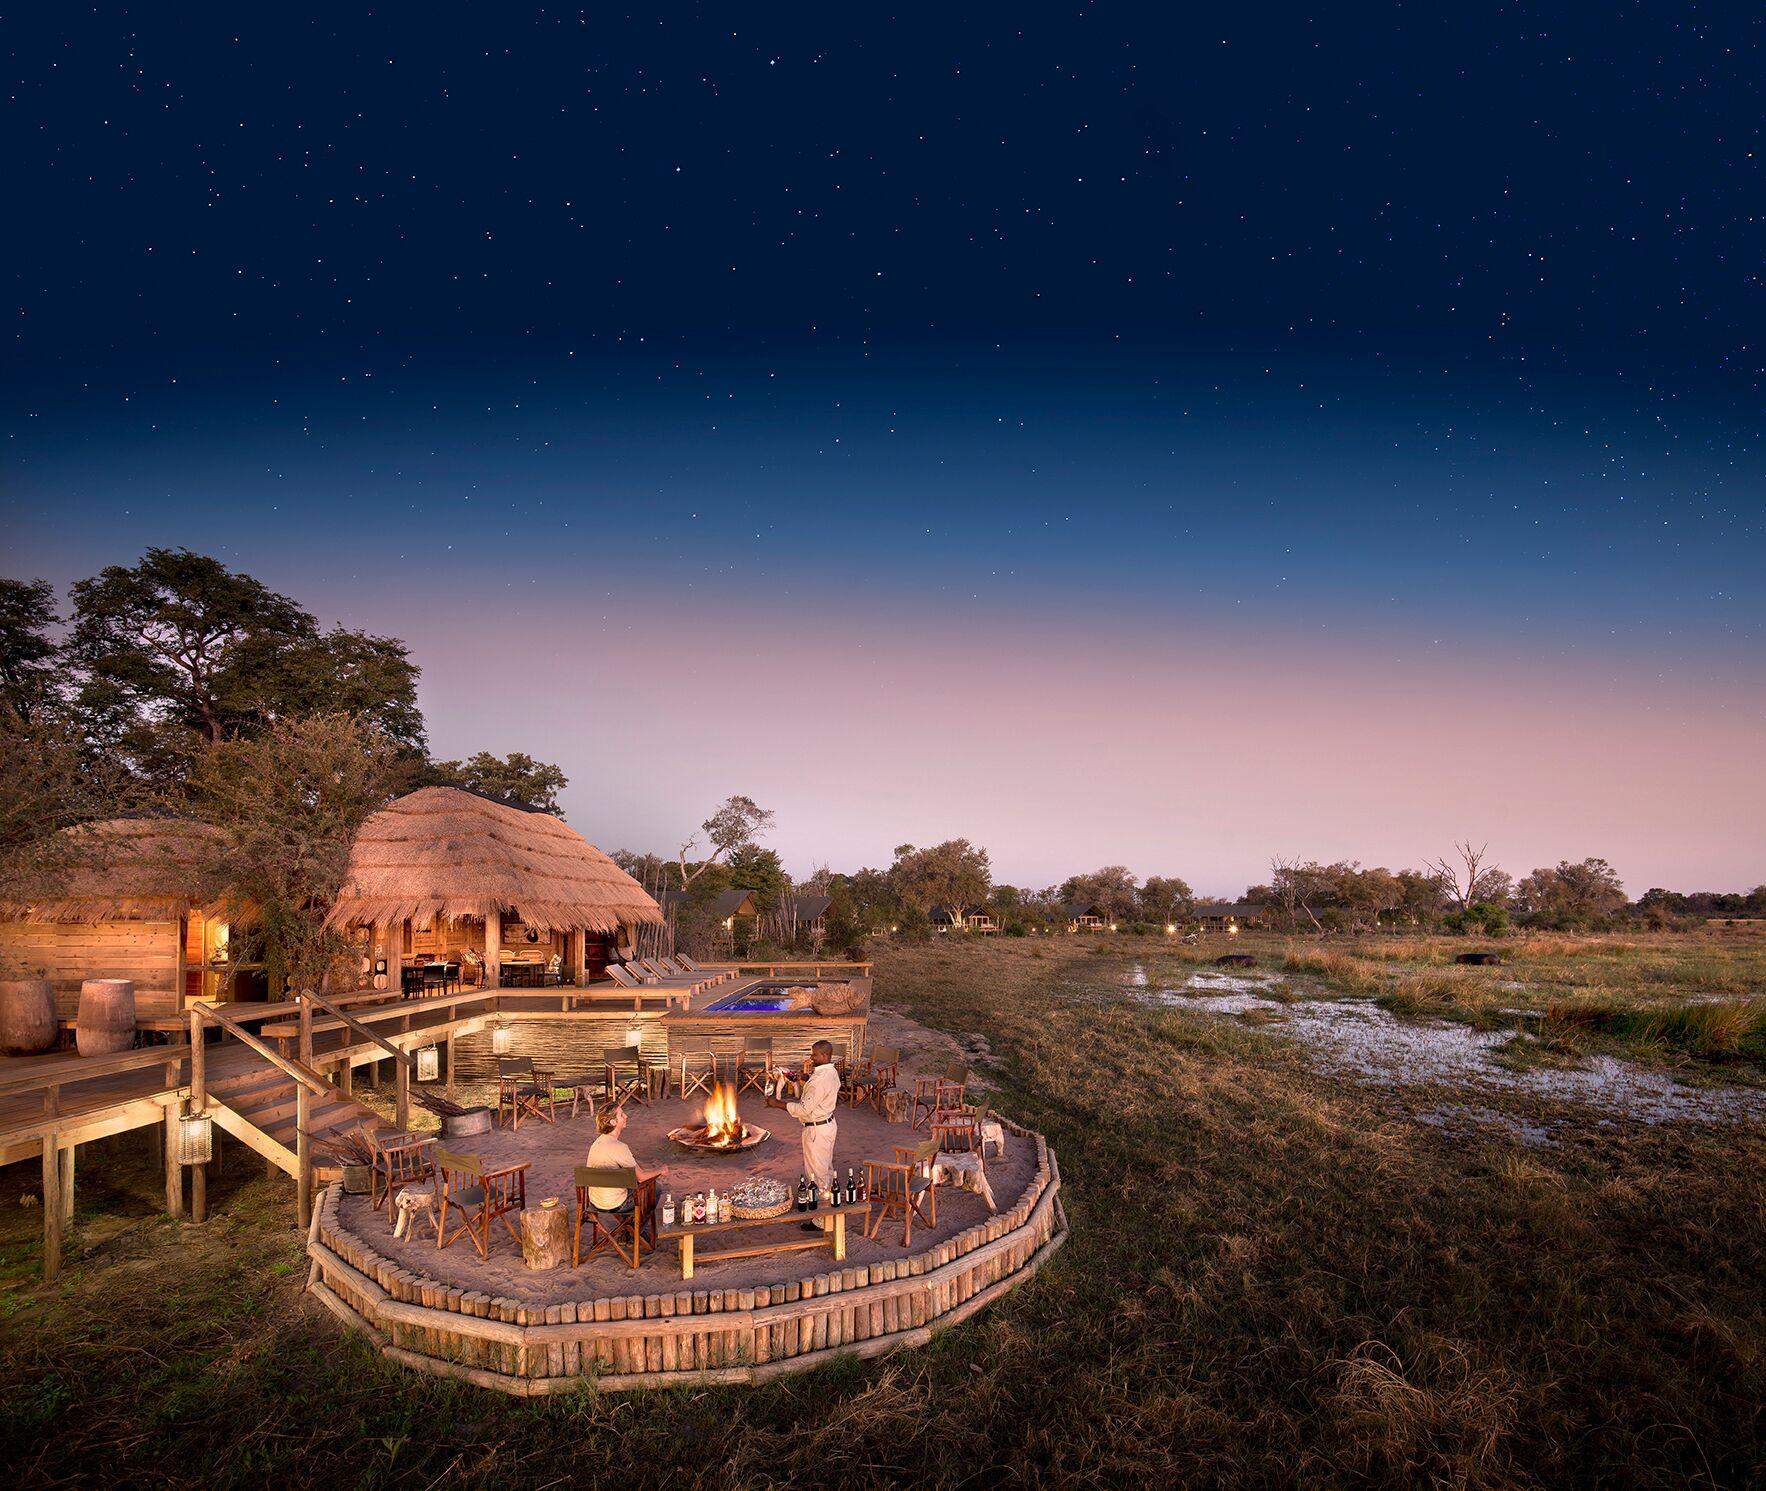 Botswana: 5 of the best safaris